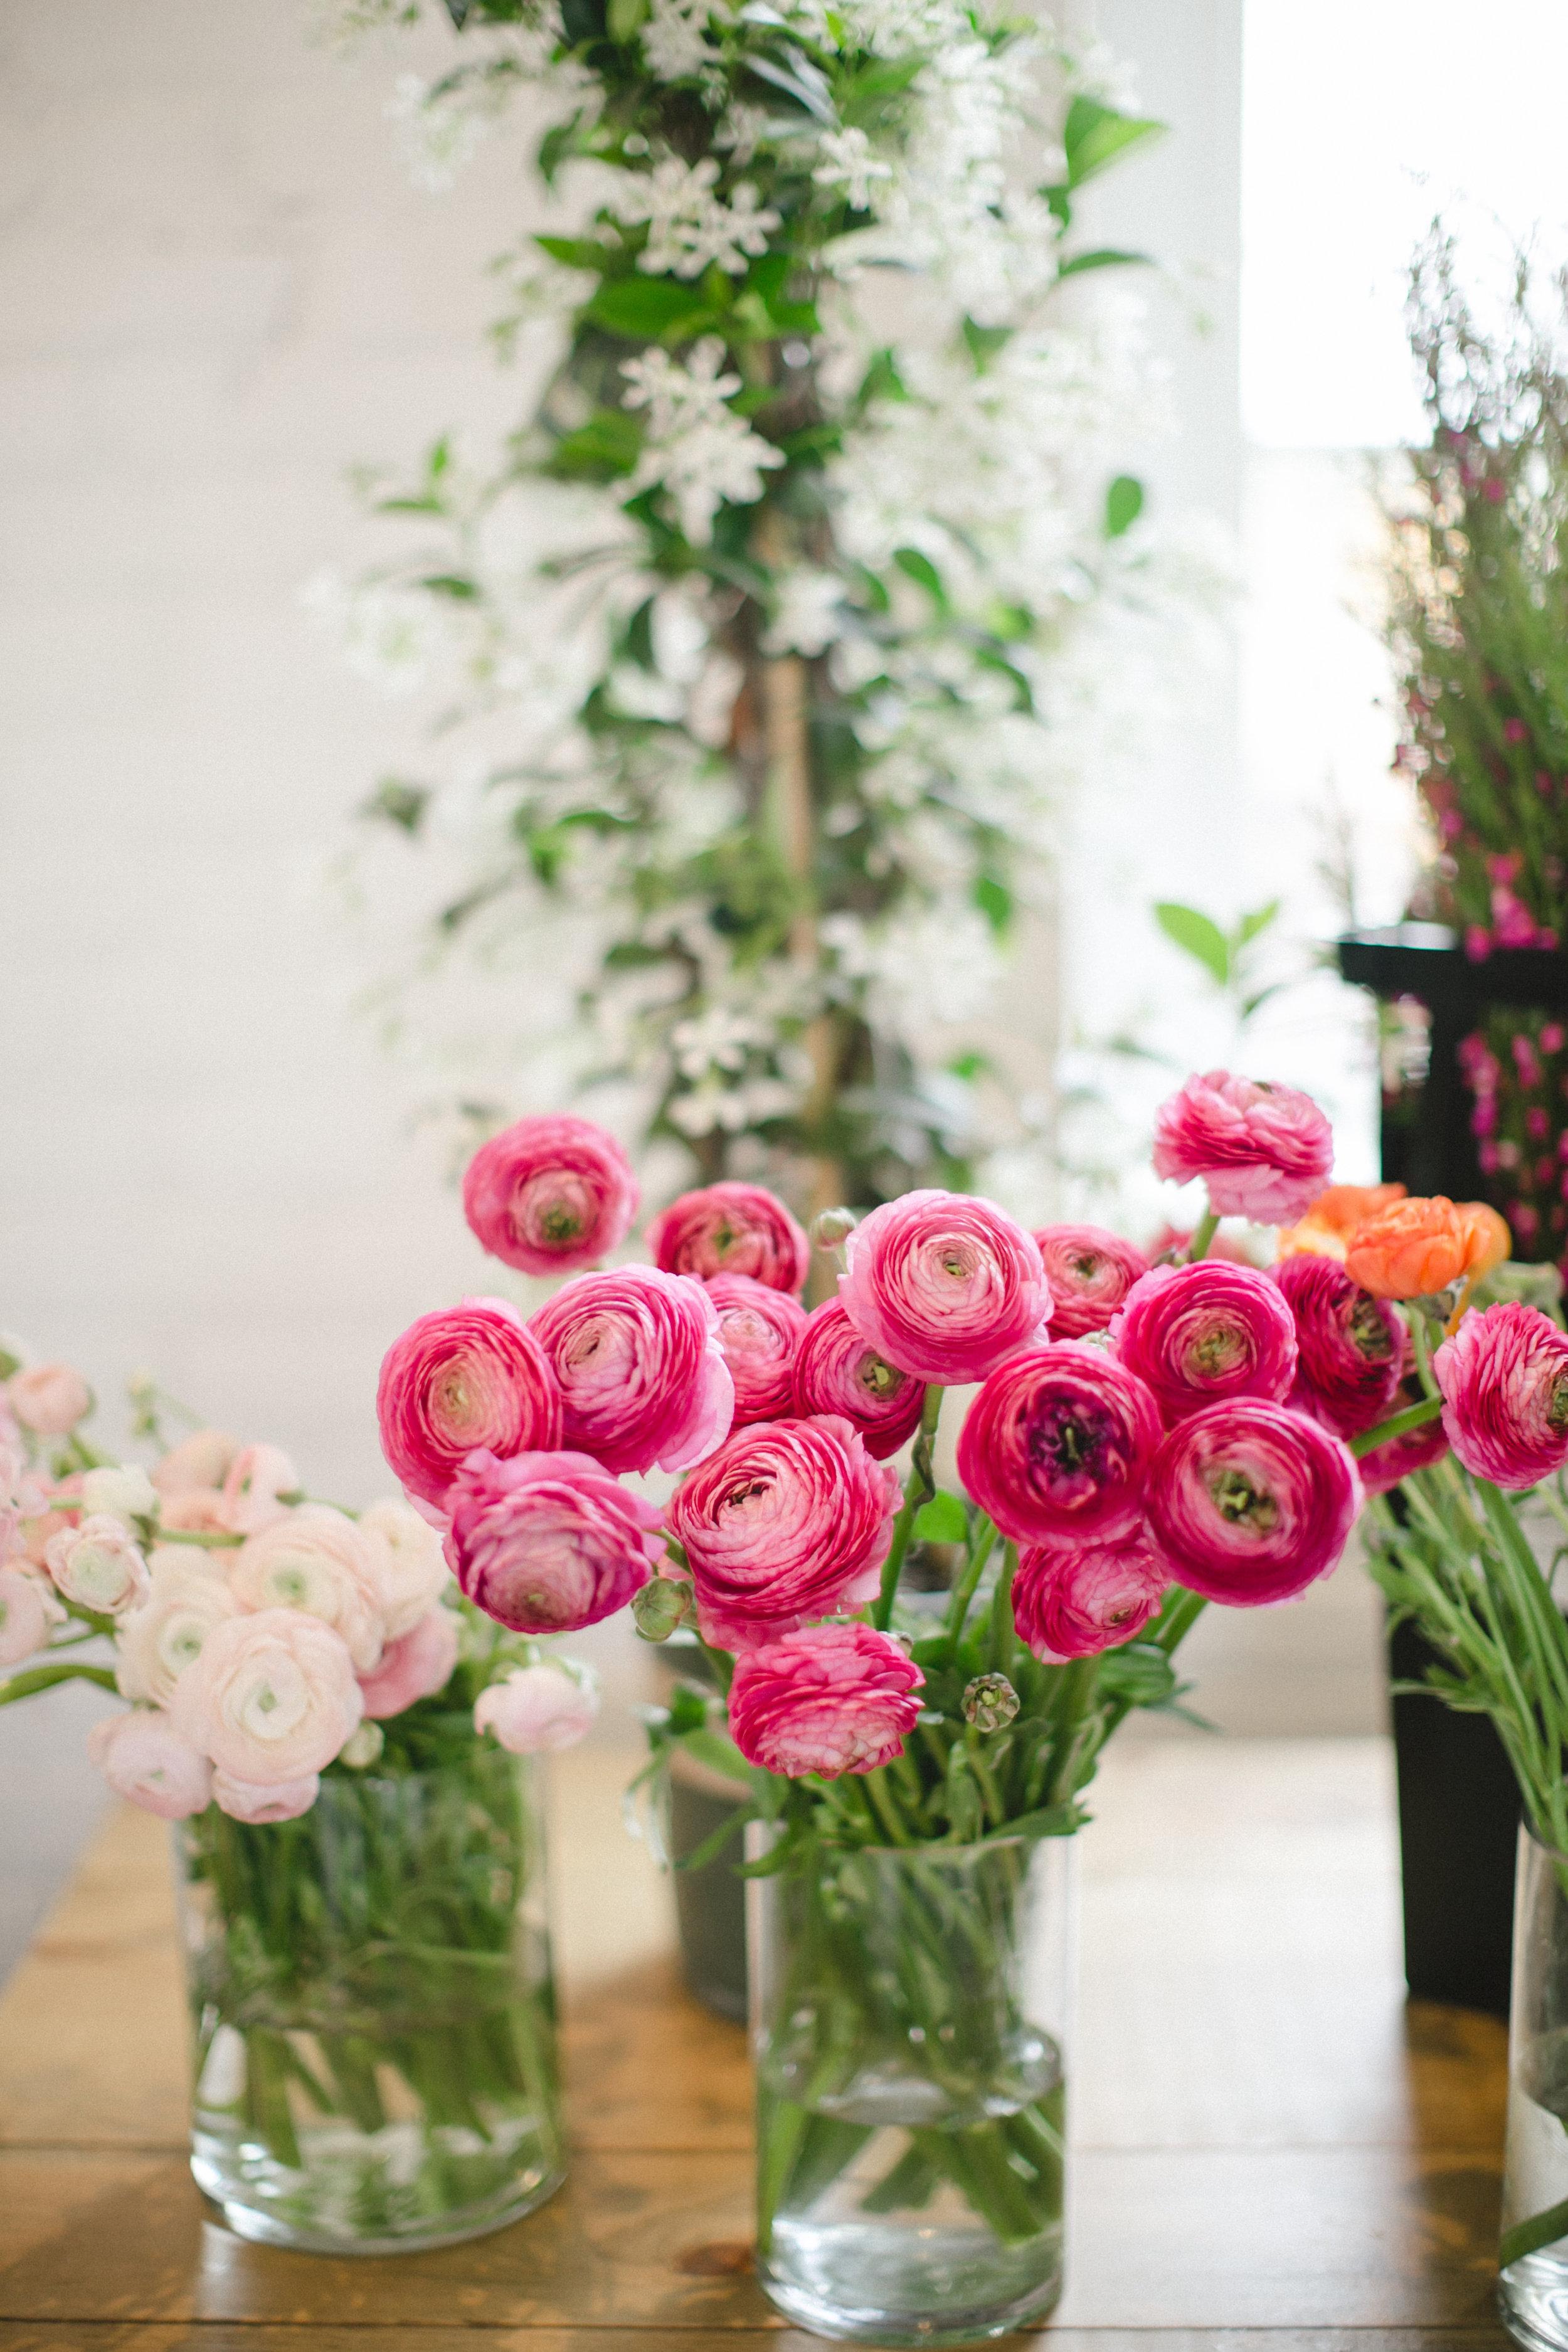 by Aimee Jobe Photography Bloom Designs Flower Workshop Brainerd-3.jpg